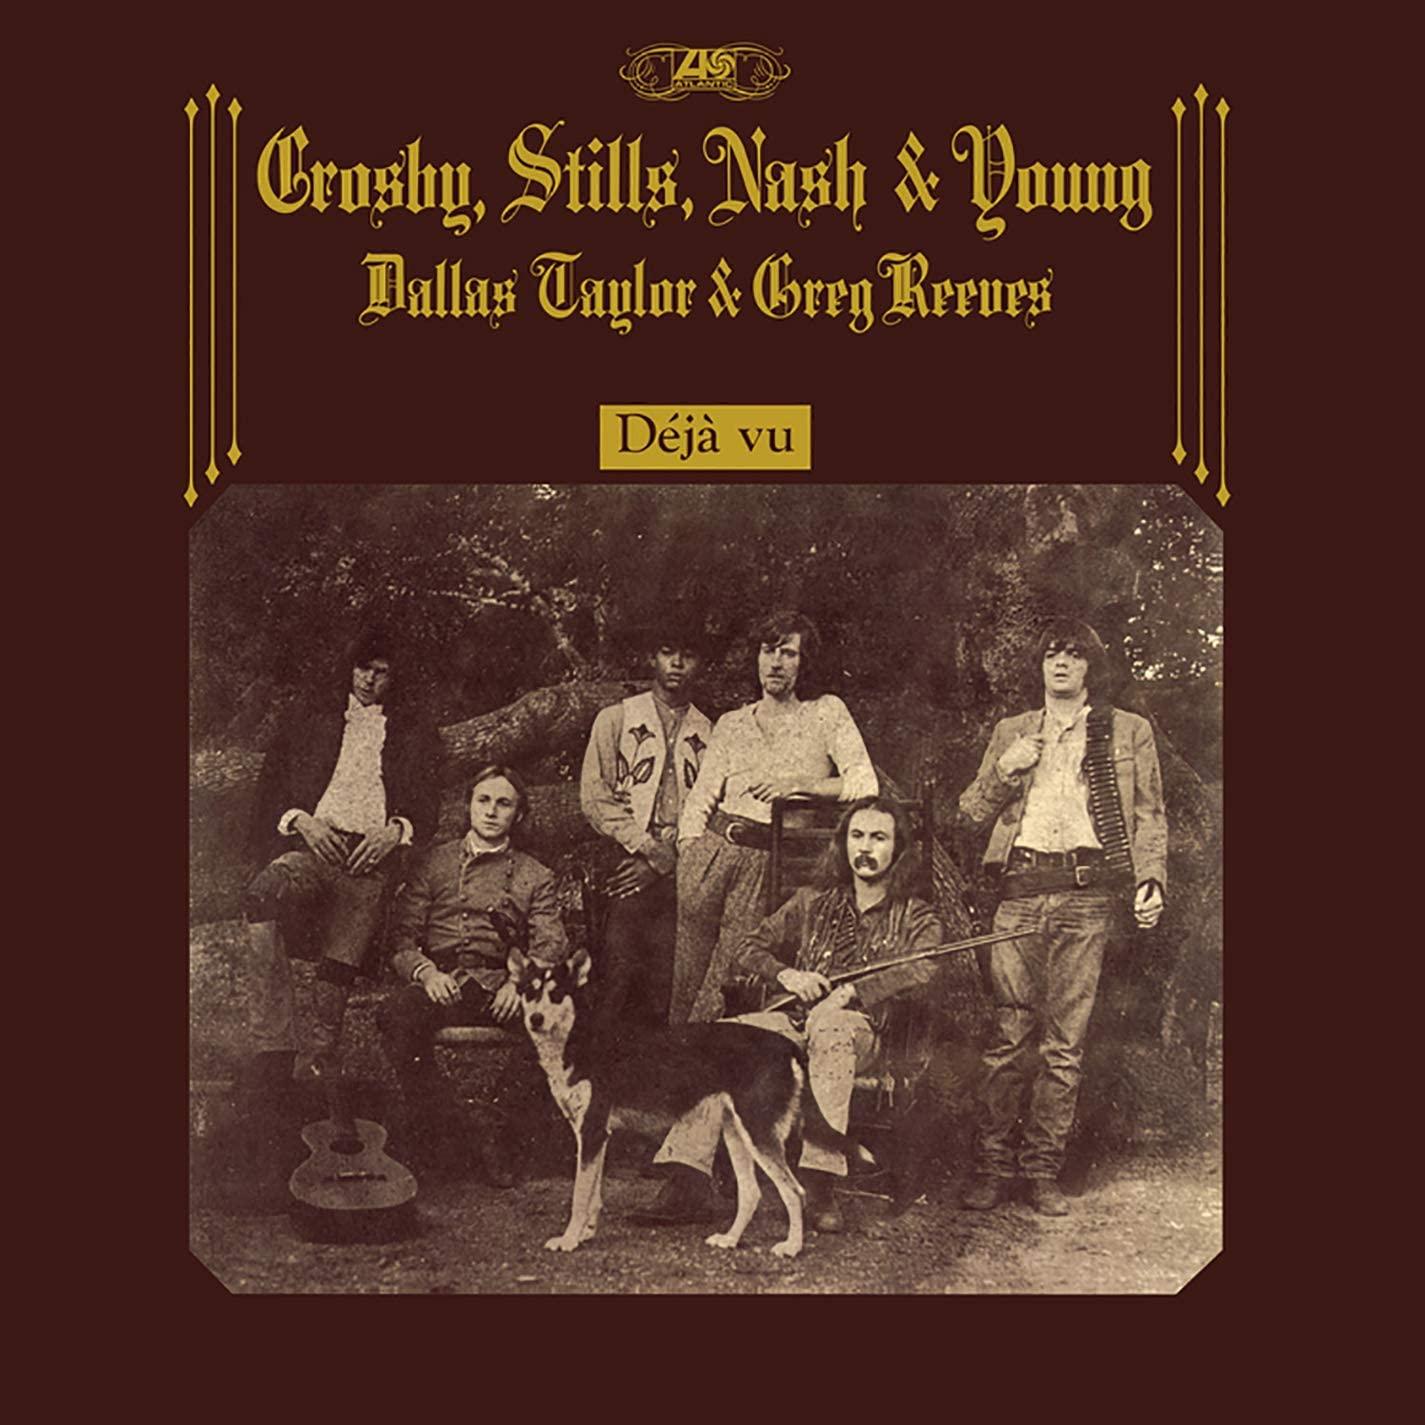 Copertina Vinile 33 giri Déjà Vu di Crosby, Stills, Nash & Young